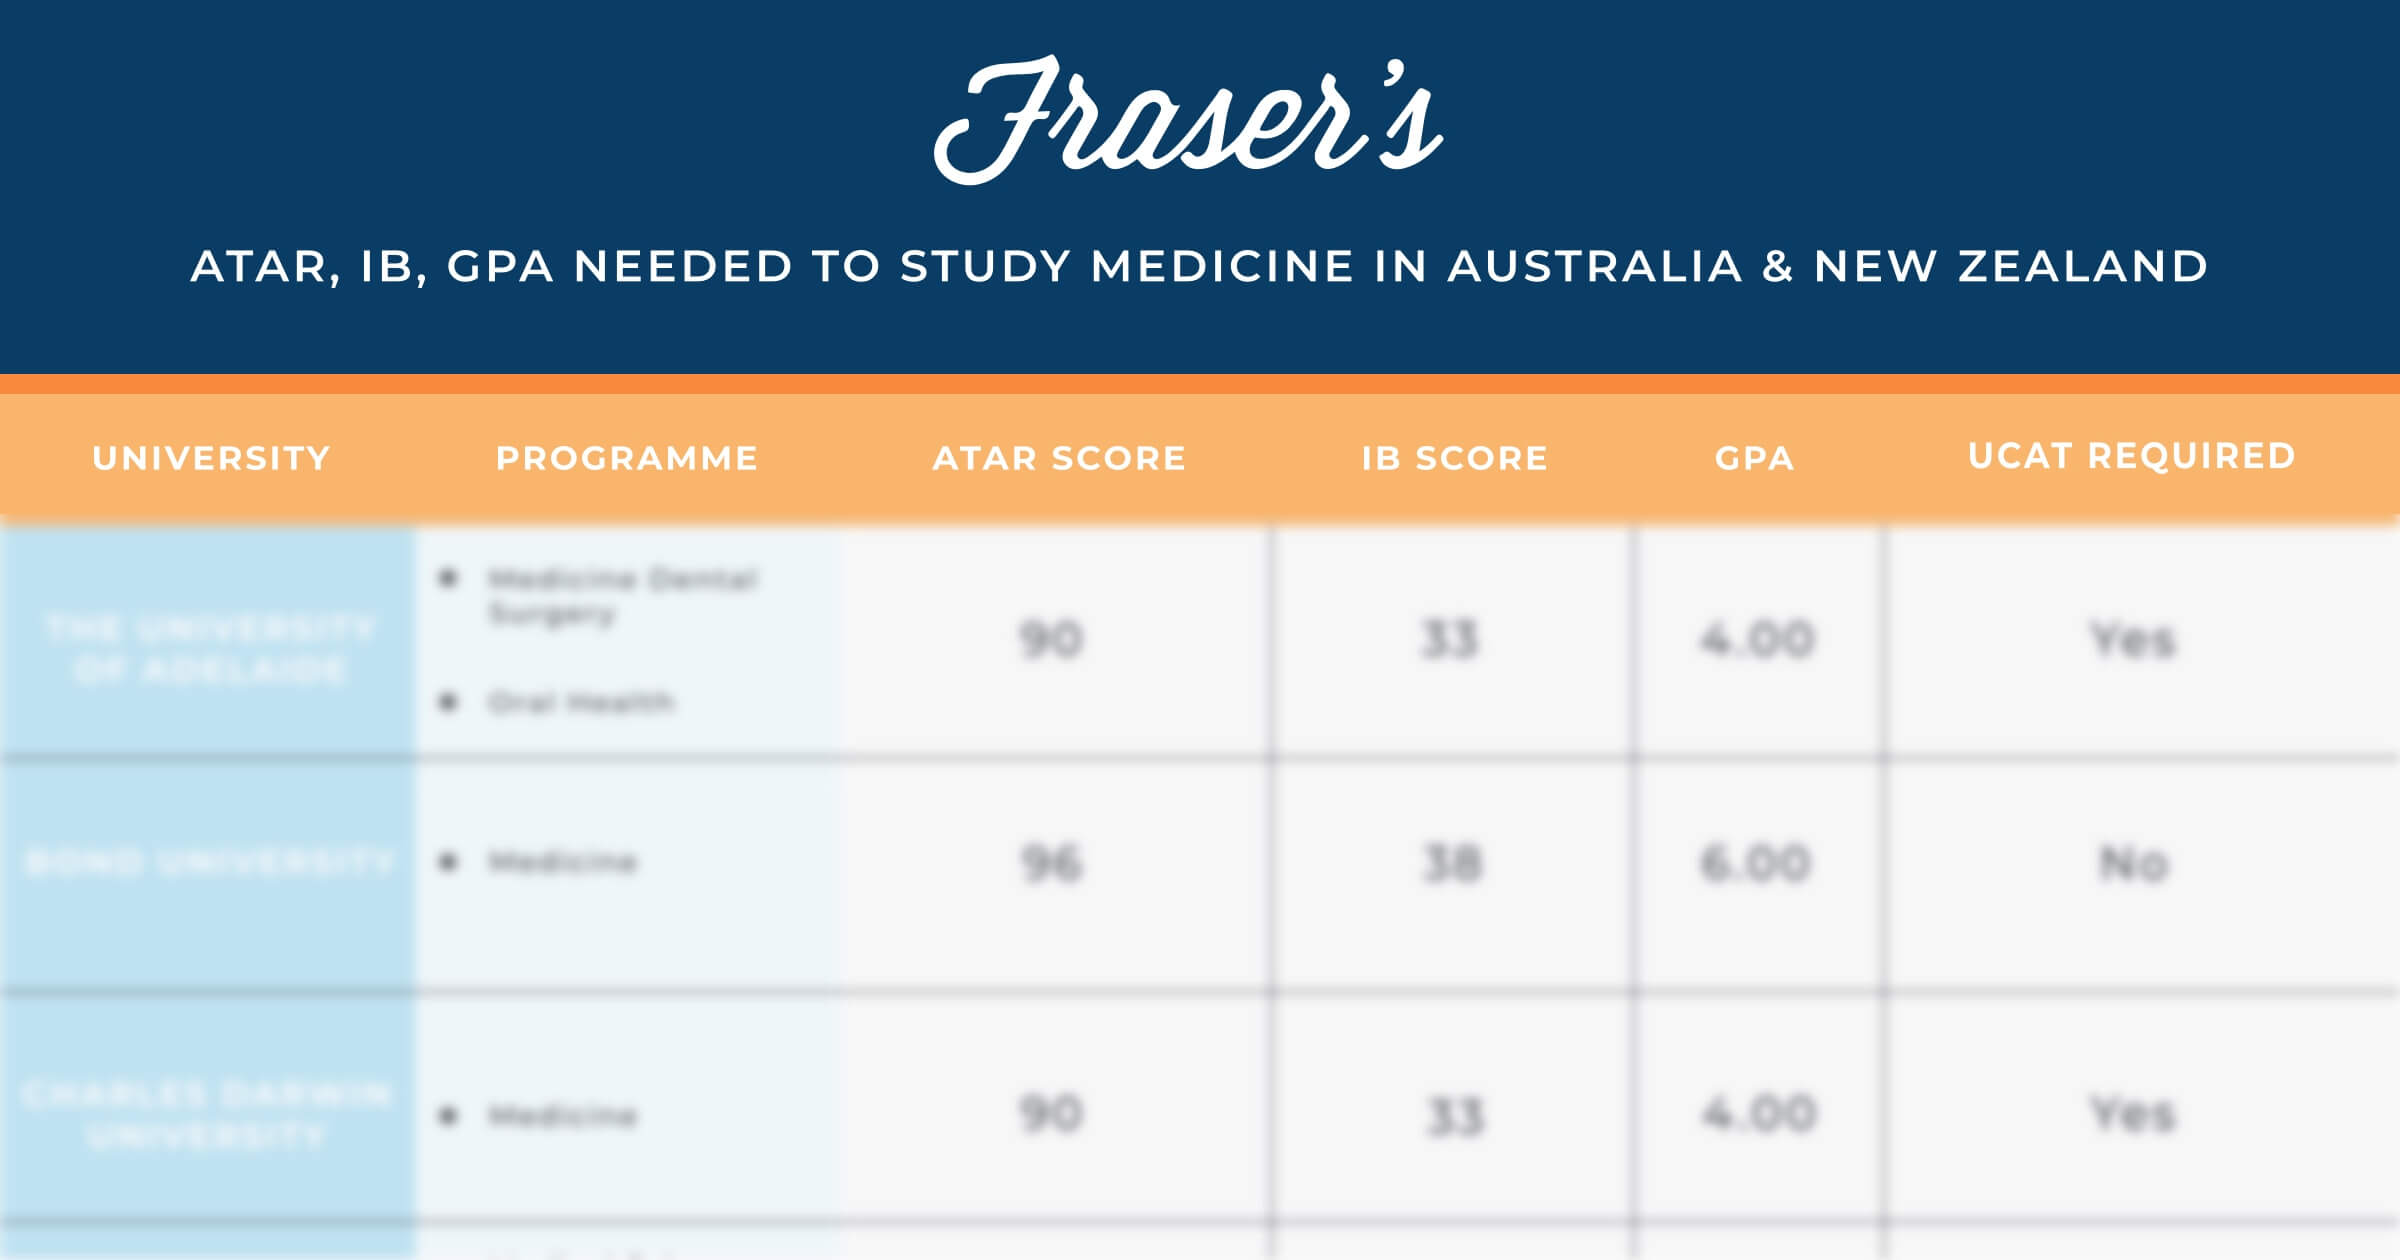 atar, ib, gpa needed to study medicine in australia